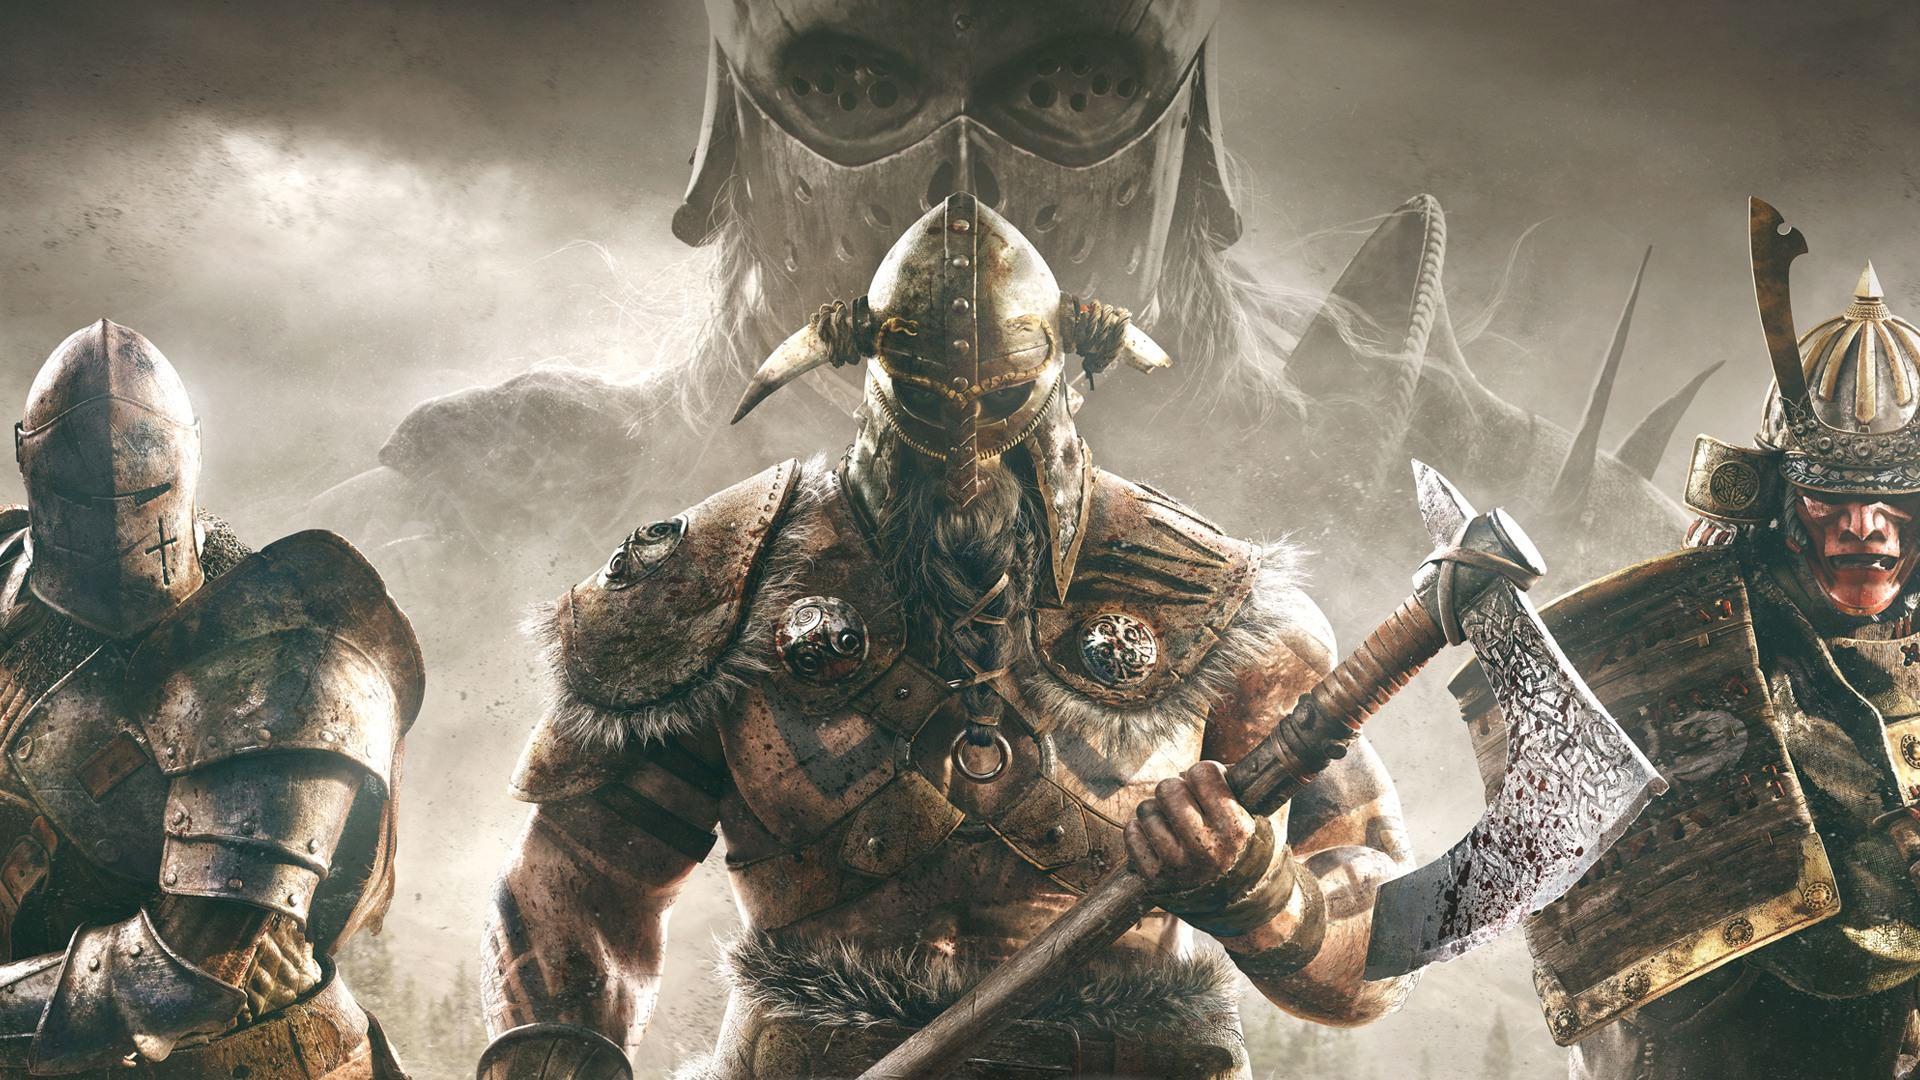 For Honor Viking Wallpaper: 59 Best Free For Honor Viking Wallpapers